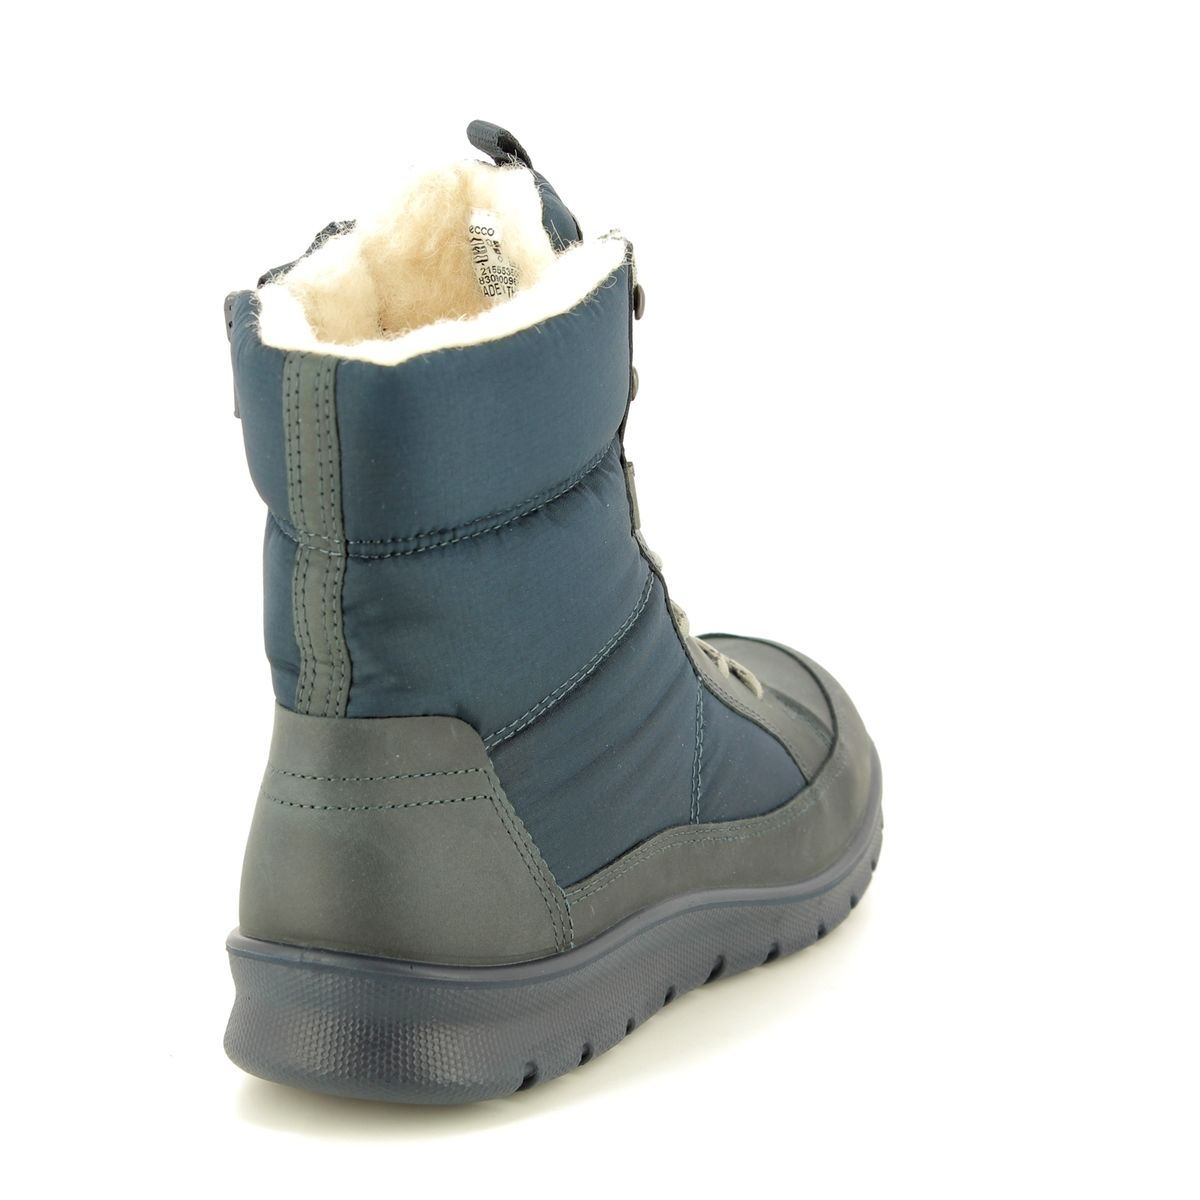 5b6ae79a19c ECCO Winter Boots - Navy nubuck - 215553 50642 BABETT BOOT GORE-TEX 85